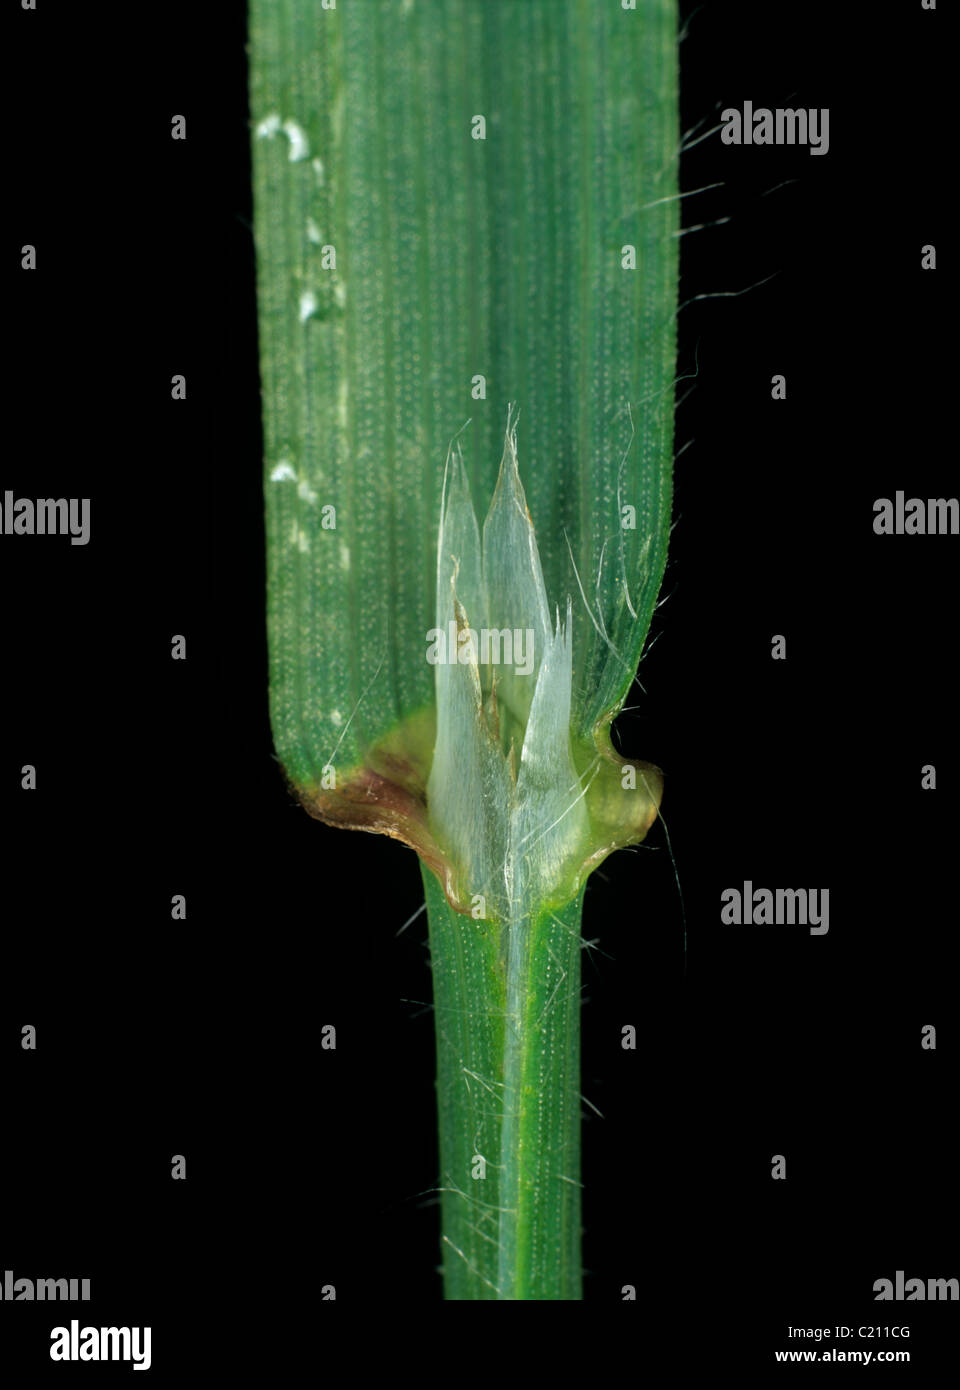 Giant brome Bromus diandrus leaf ligule - Stock Image